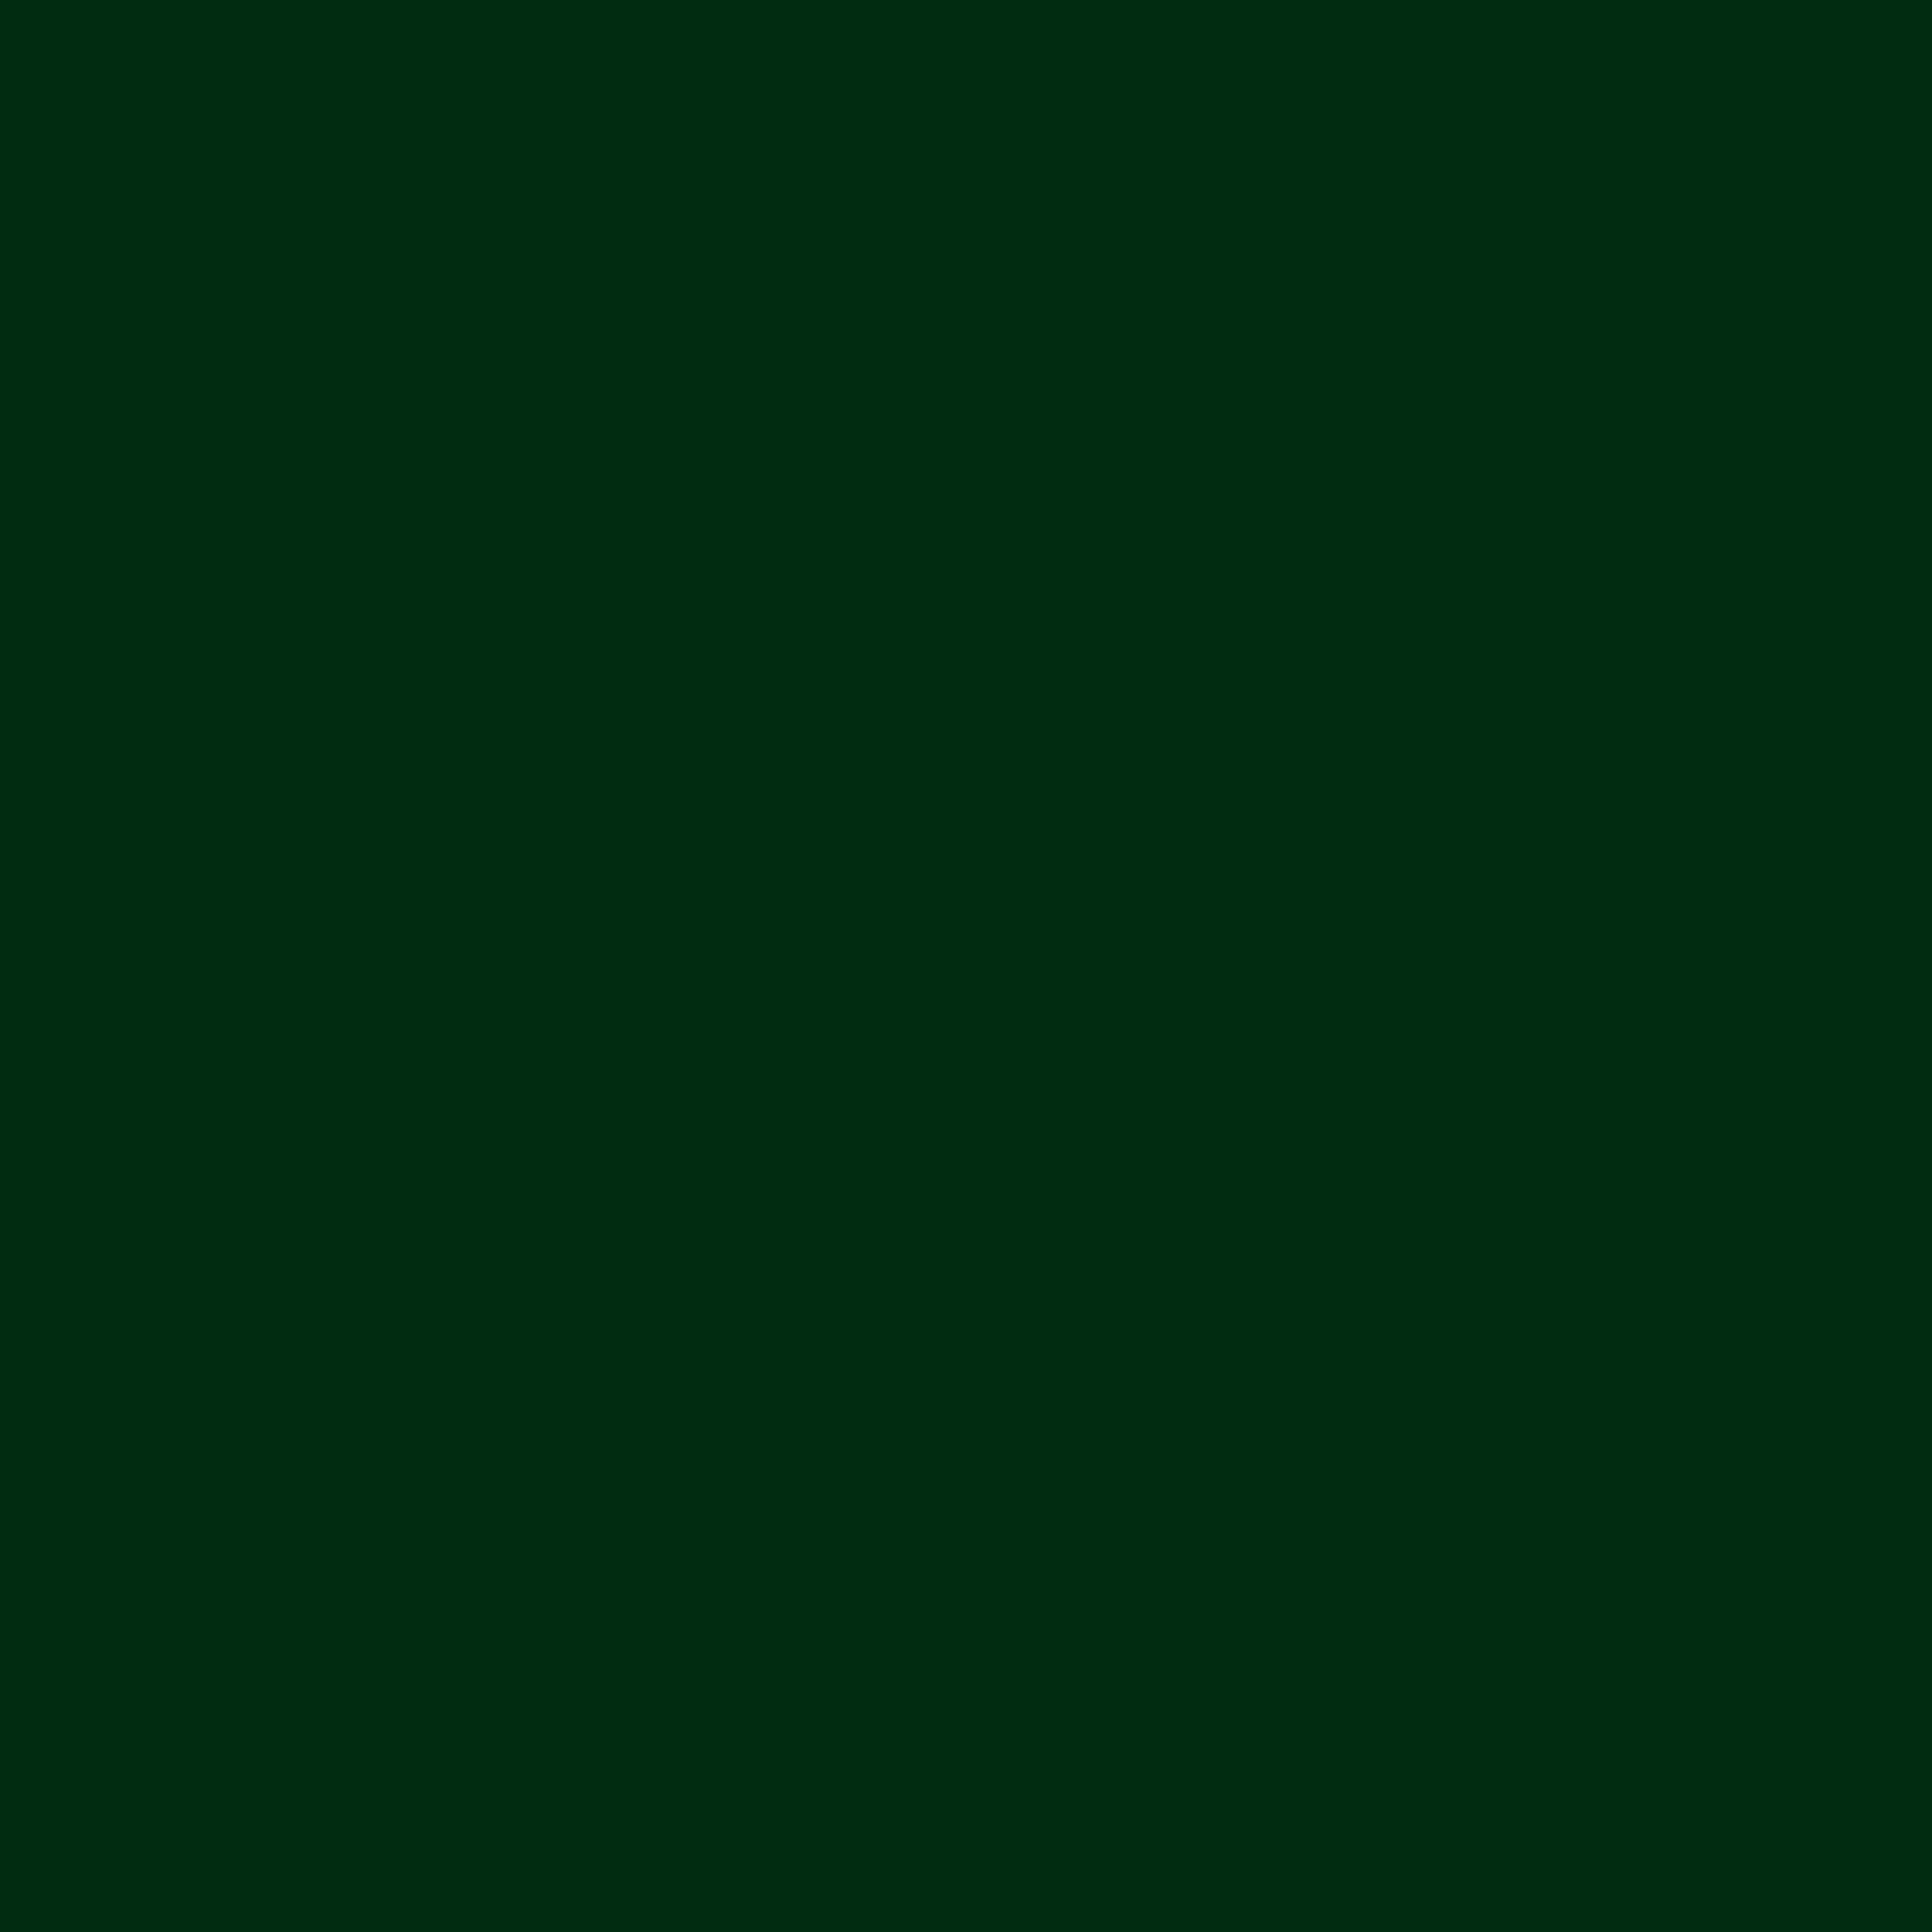 Kombu green